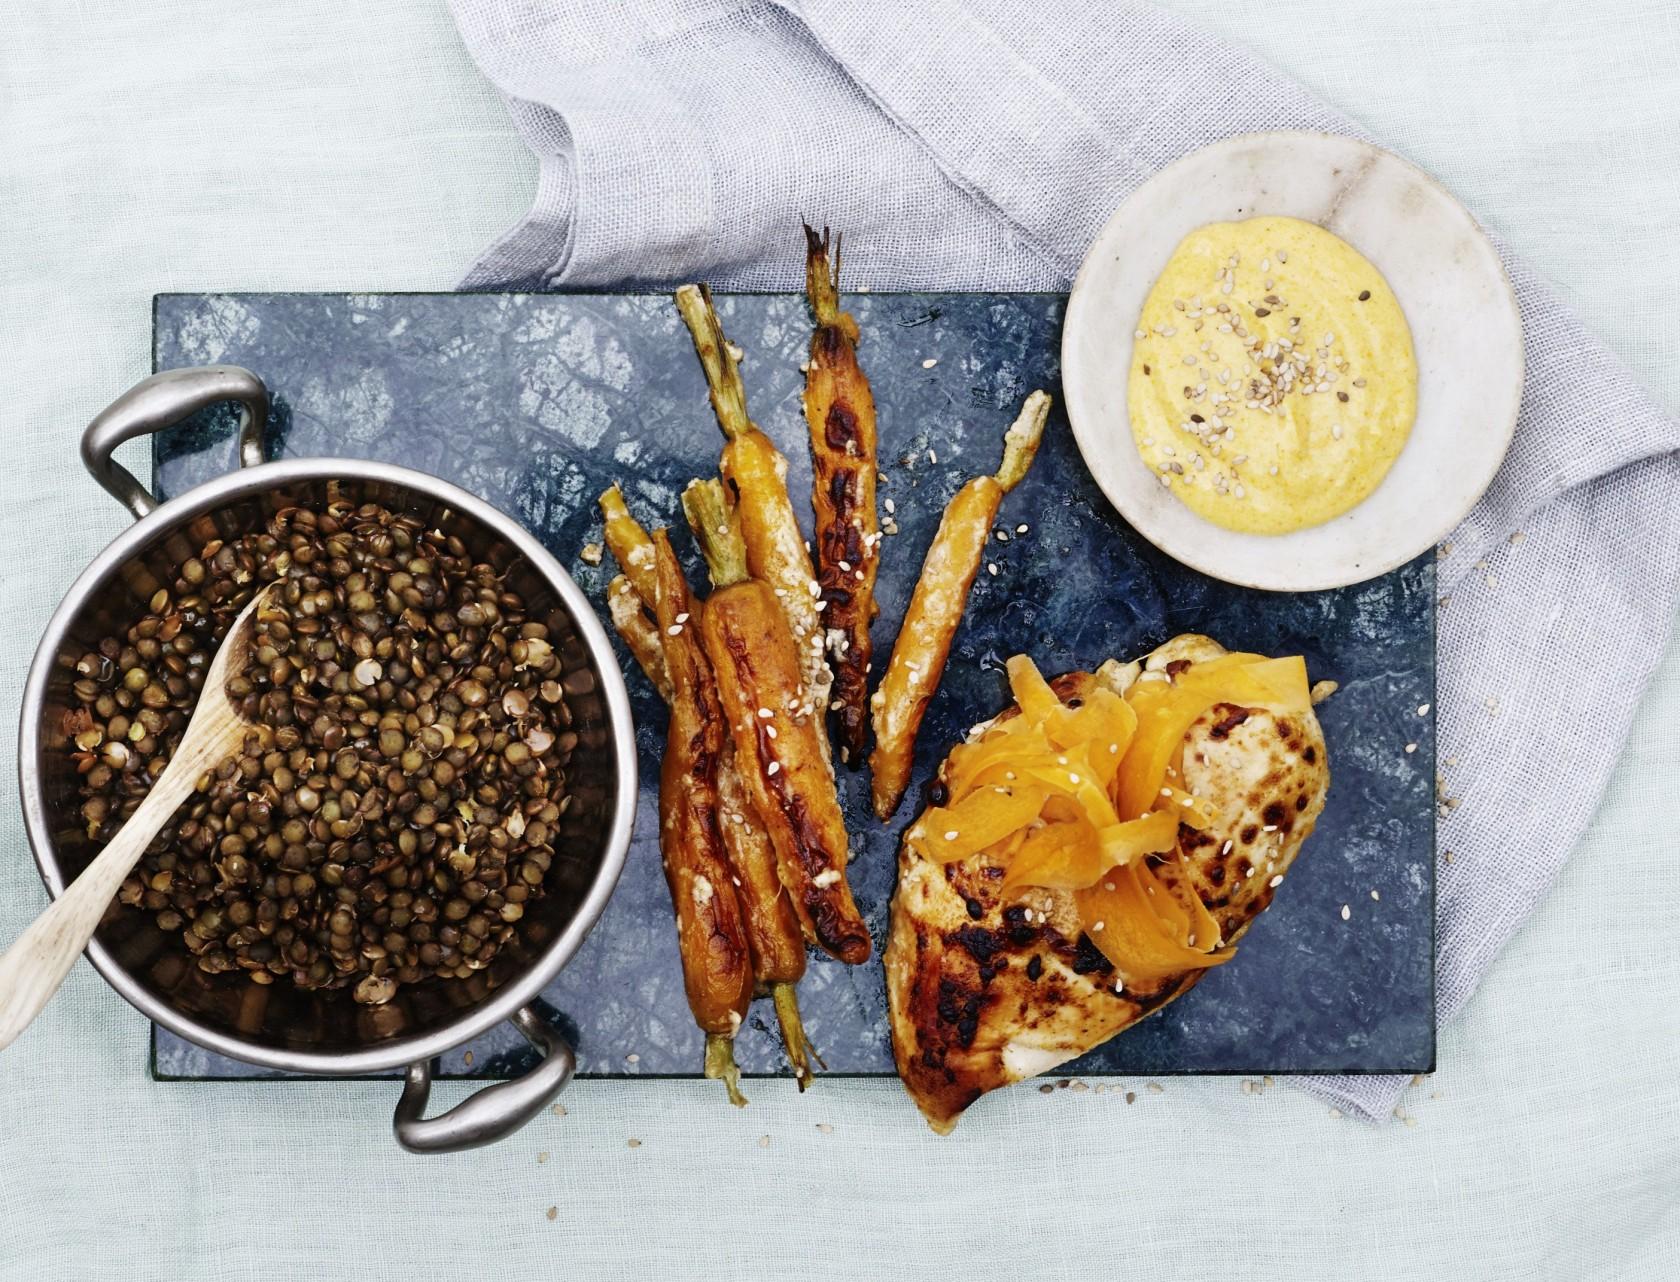 Tandoori-kylling med gulerødder og linser - sund og lækker hverdagsmad